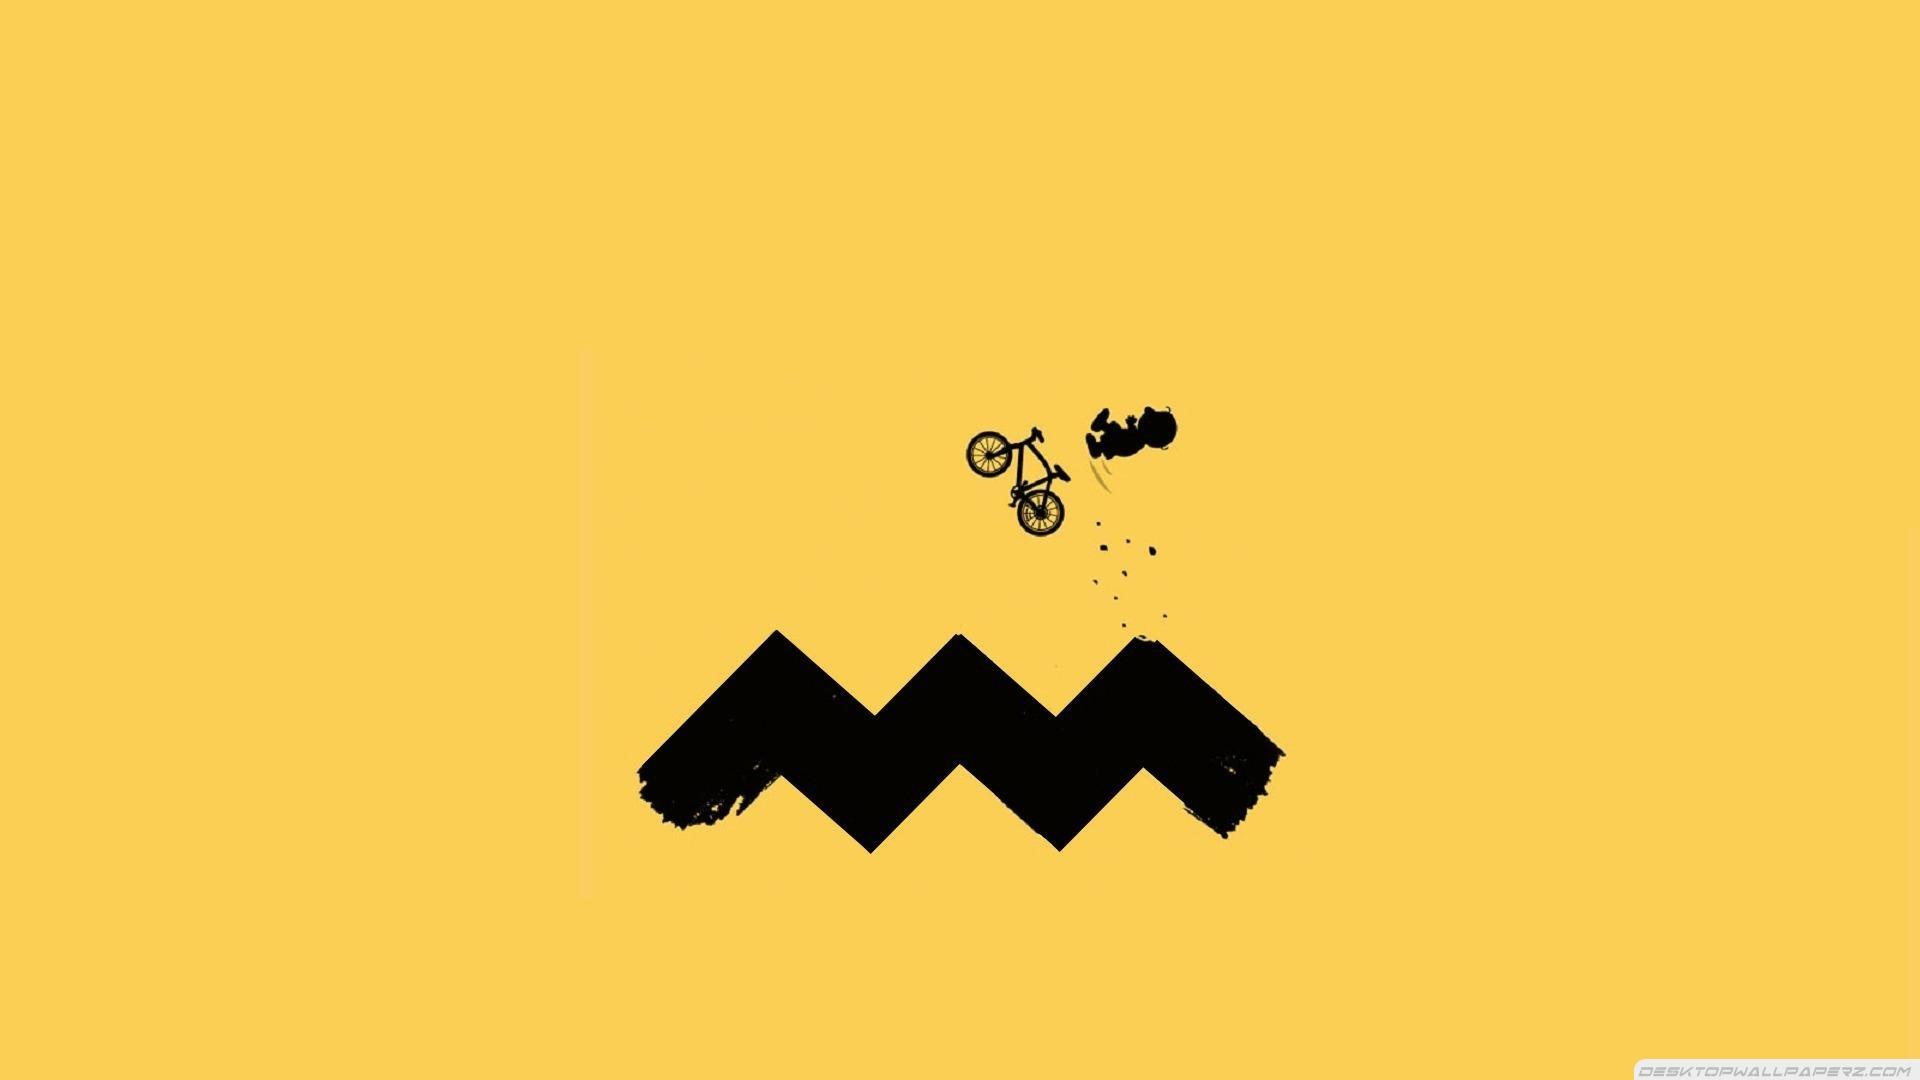 Minimalistic Funny Charlie Brown Cycling 19202151080 32476 1920x1080